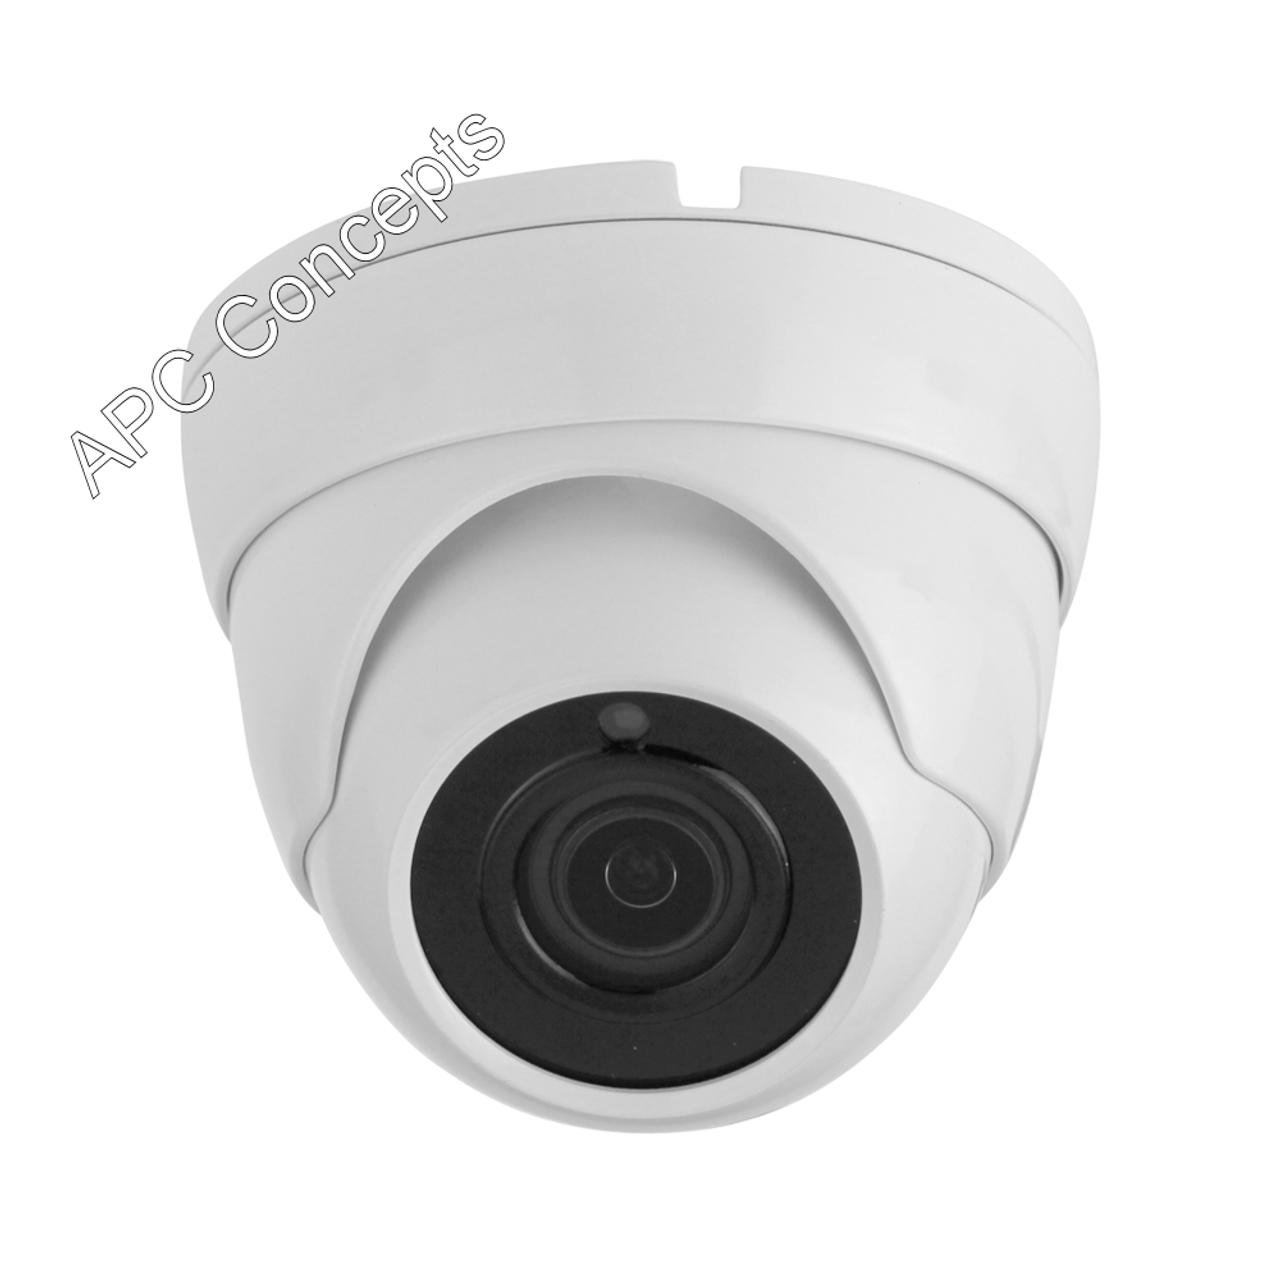 990 WFD8M 8mp HD-TVI/CVI/AHD/CVBS  3.6mm Lens White 8MP Dome Camera